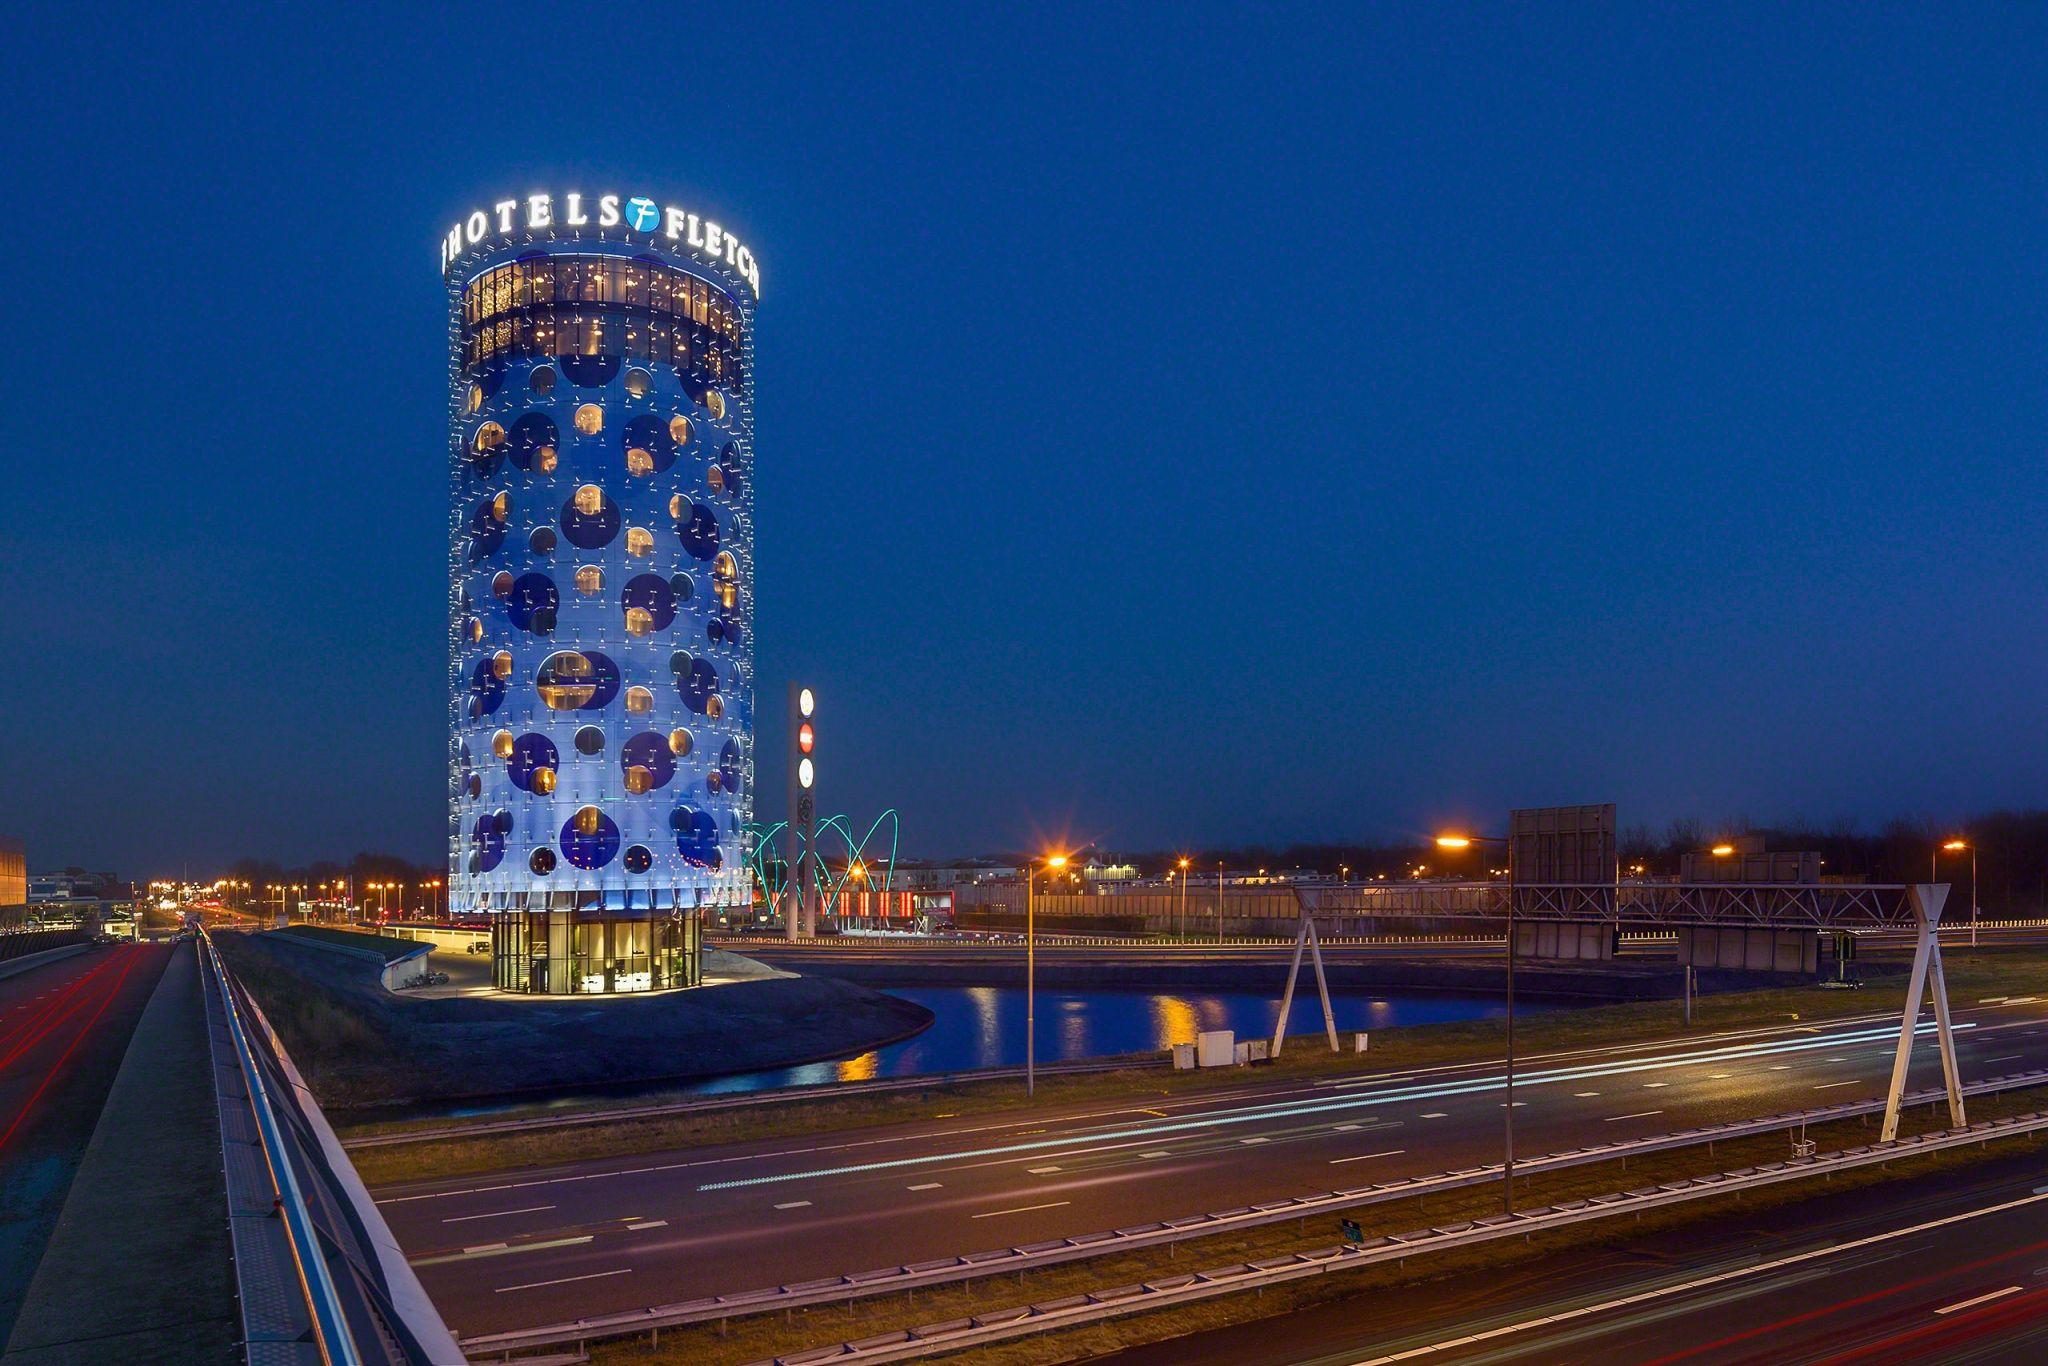 Interior designer Robert Kolenik created the entire hotel interior design for the Fletcher hotel in Amsterdam in collaboration with Benthem Crouwel Architects.